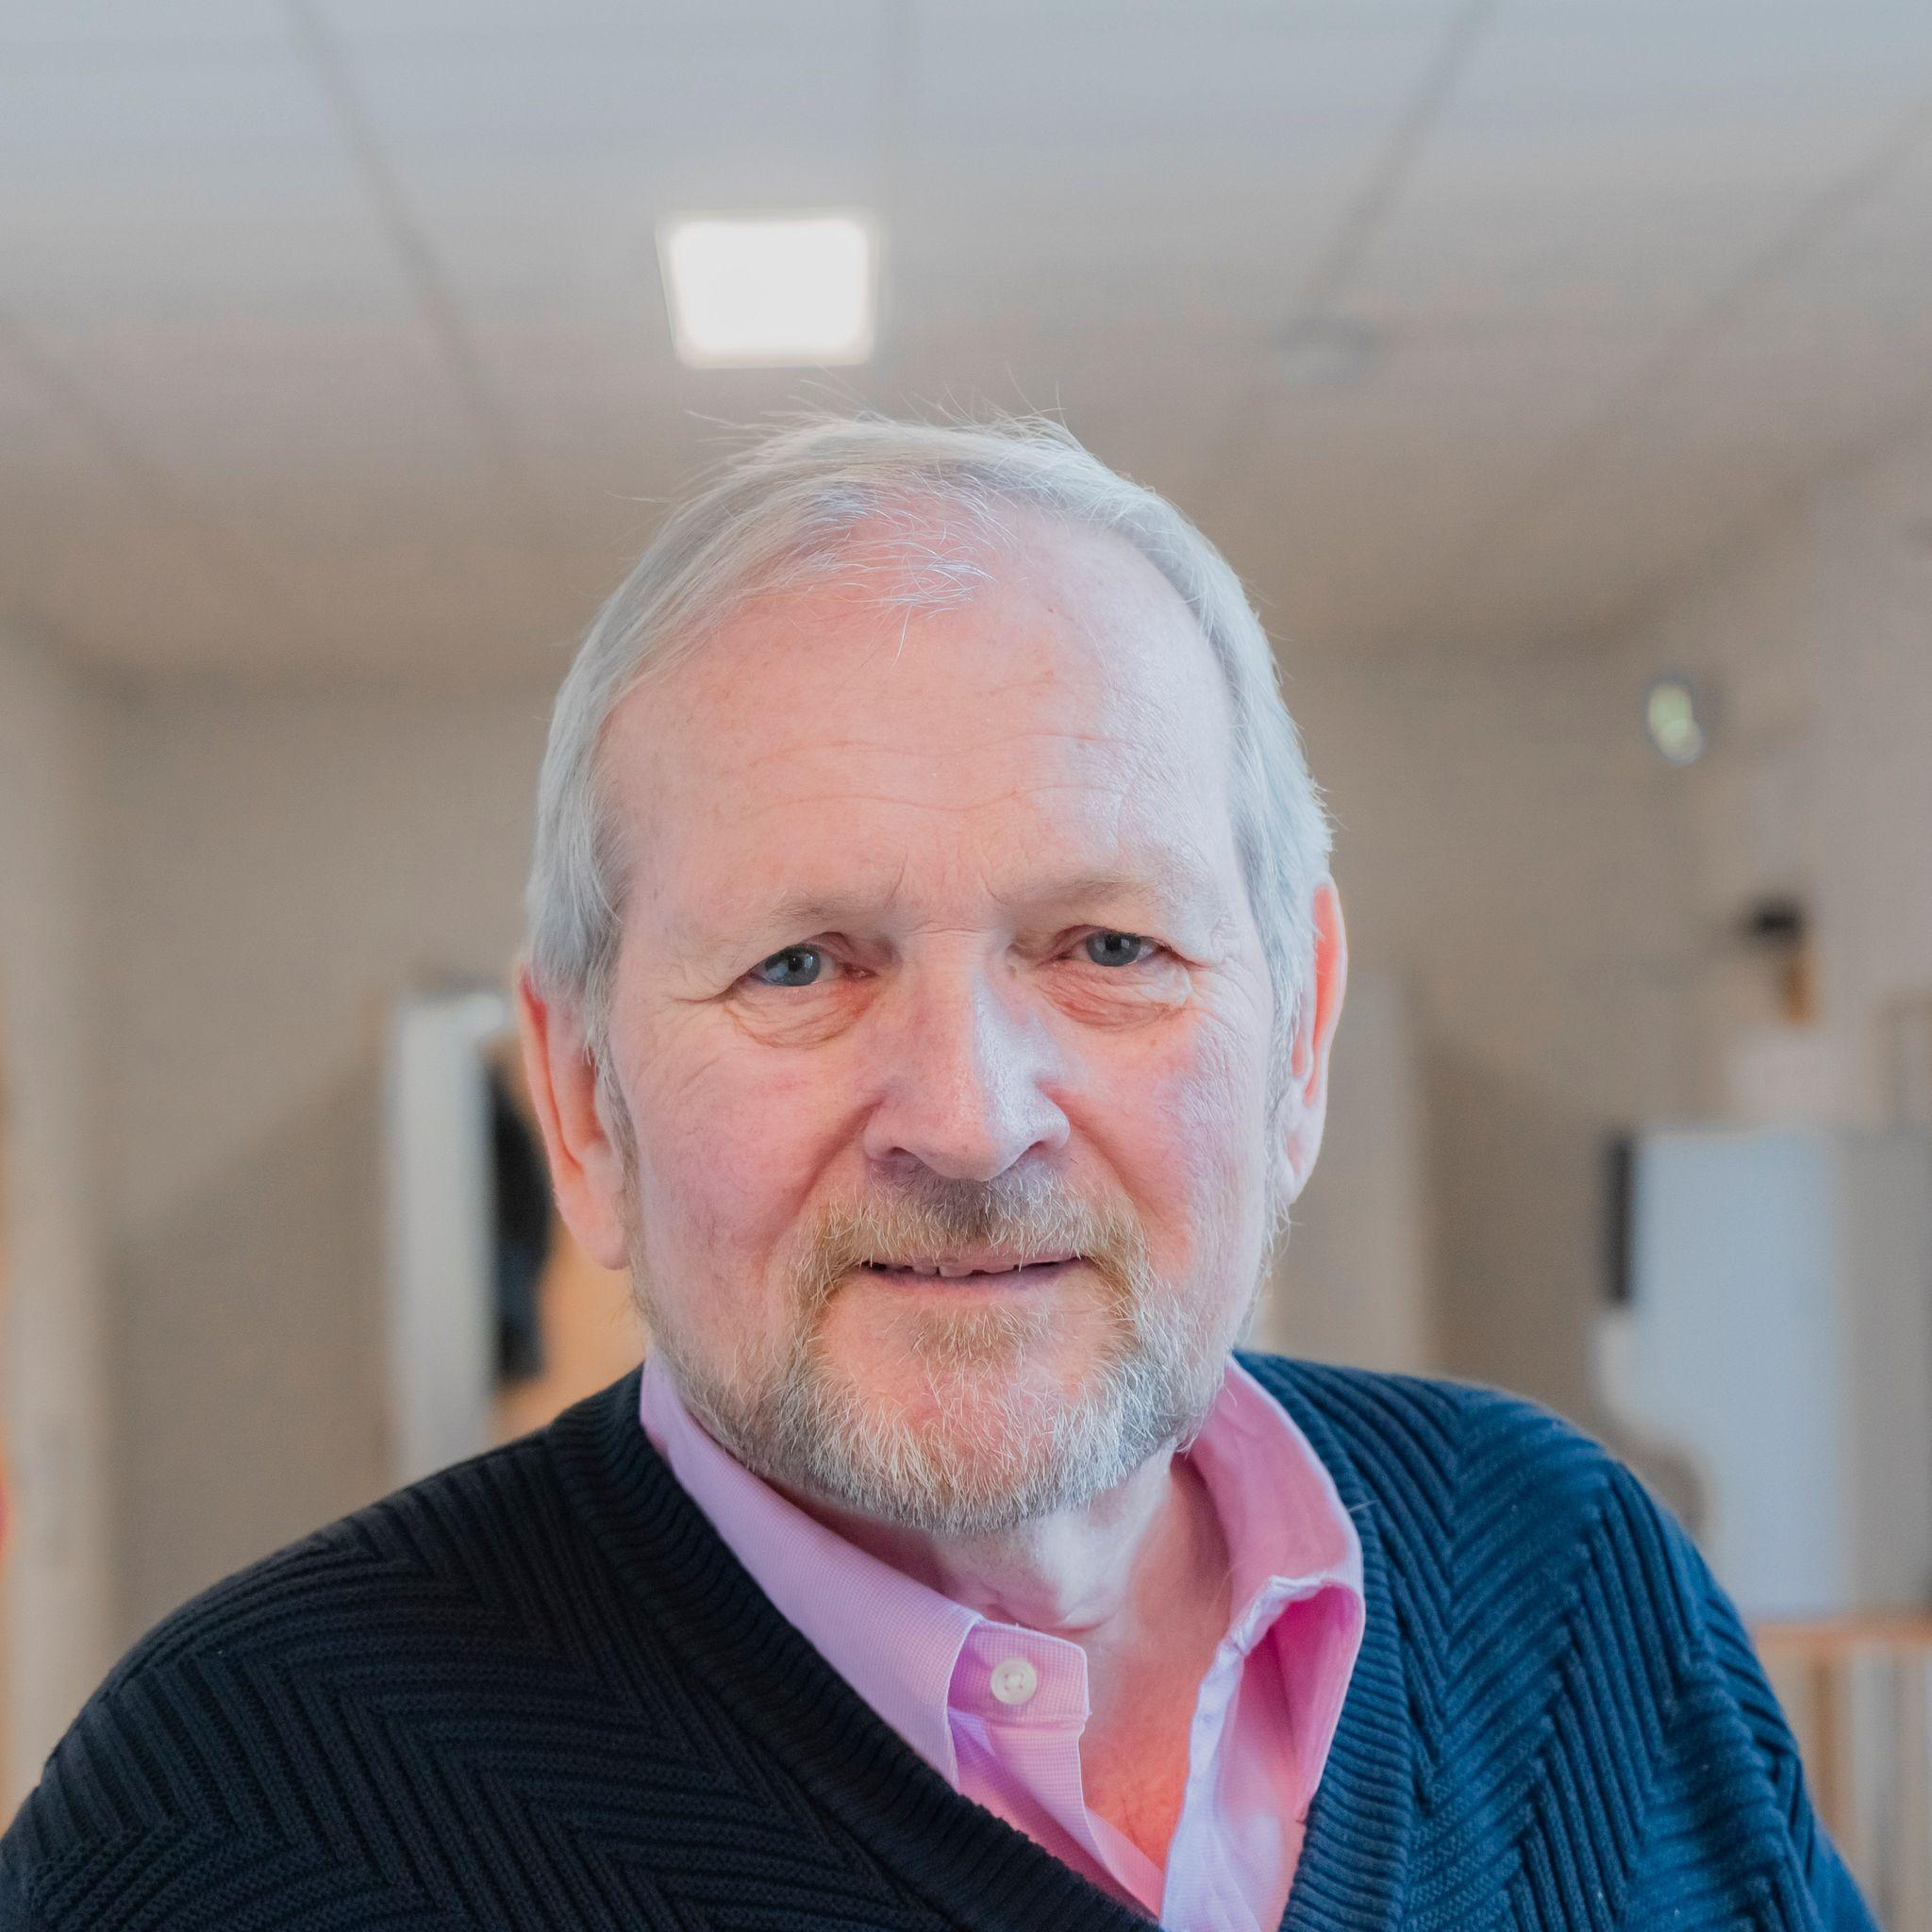 Olav Ljøsne